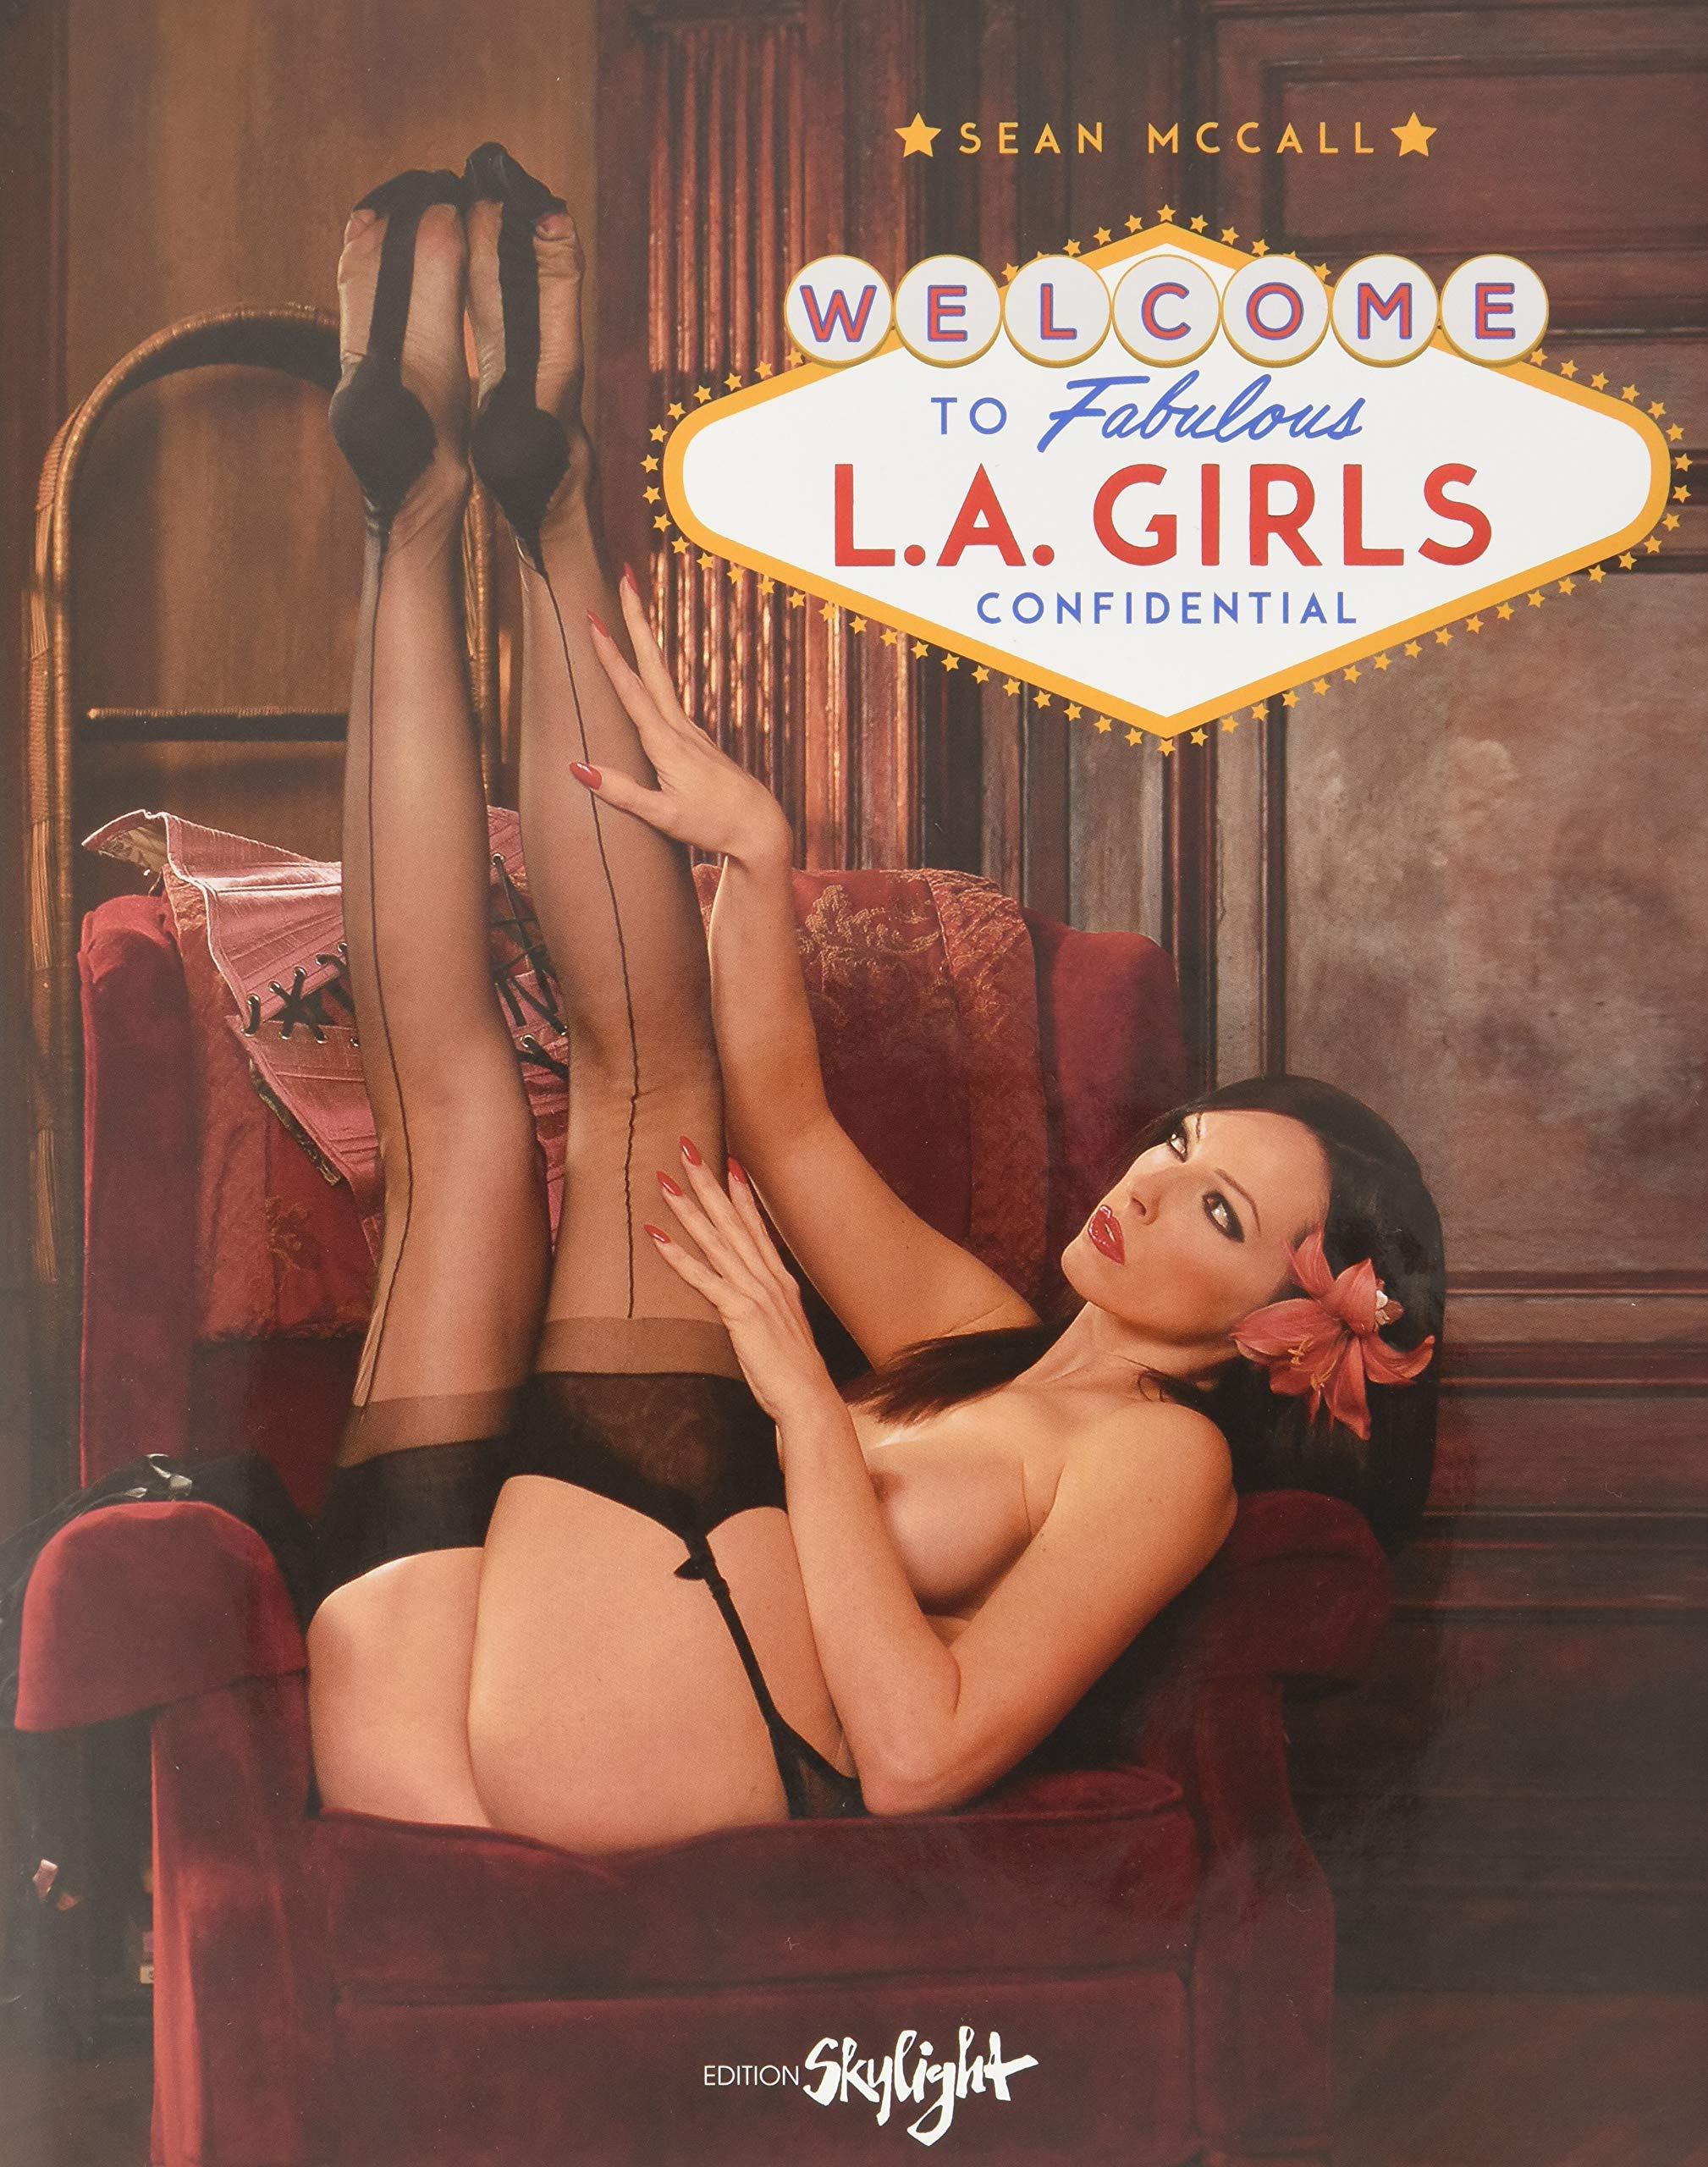 Welcome to Fabulous L.A. Girls Confidential: Englisch/Deutsche Originalausgabe.